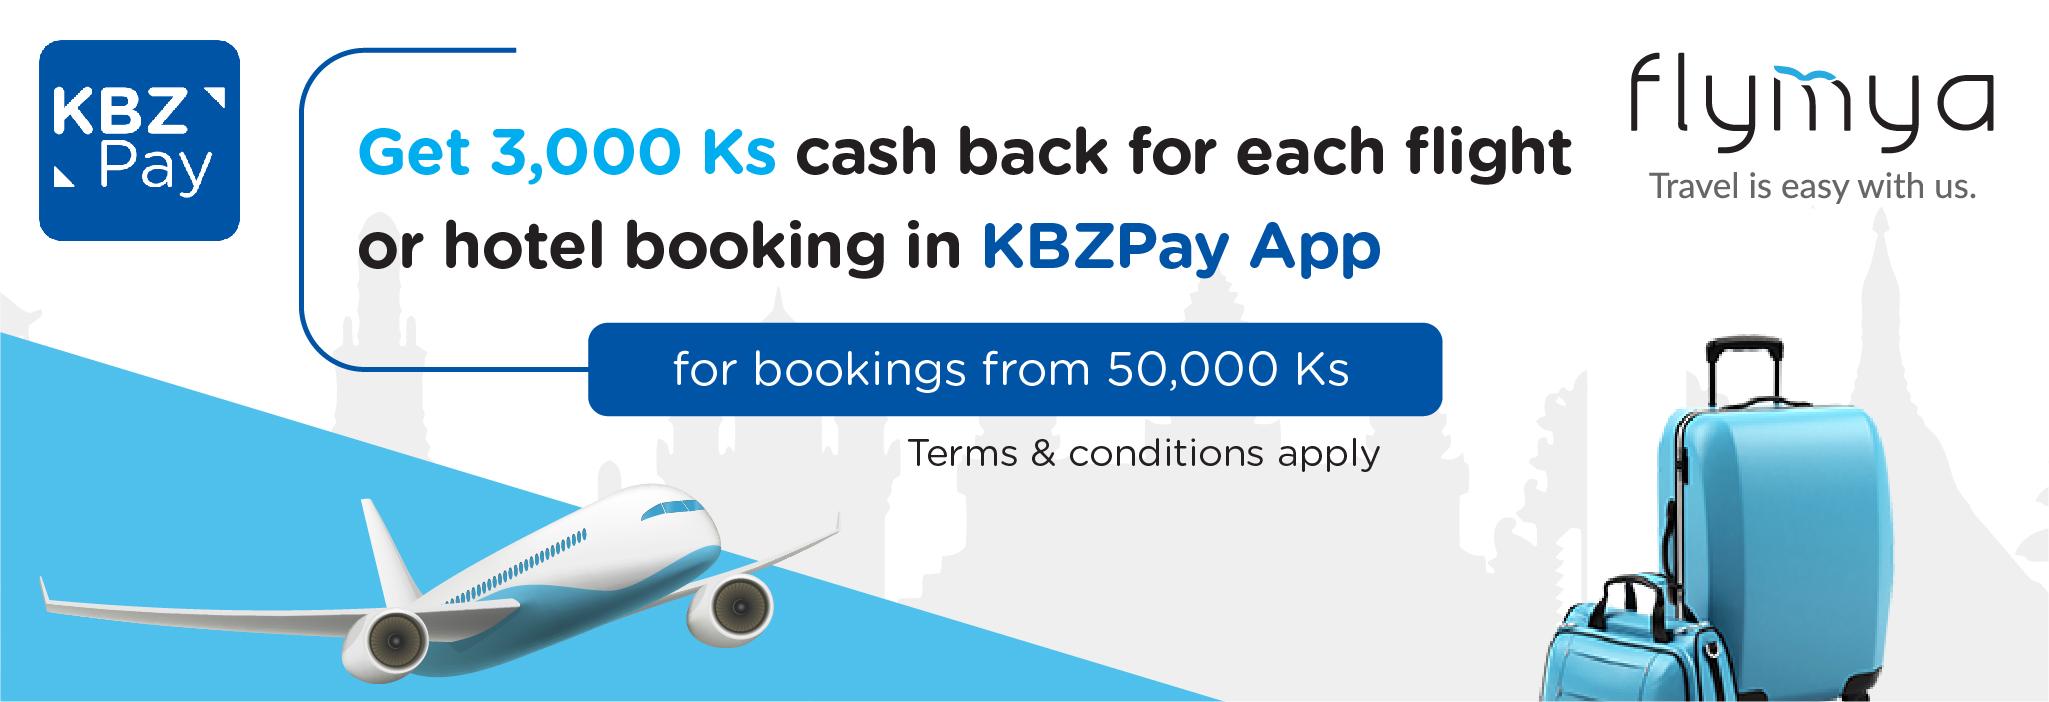 Get cash back 3,000 kyats for Flymya bookings in KBZPay!